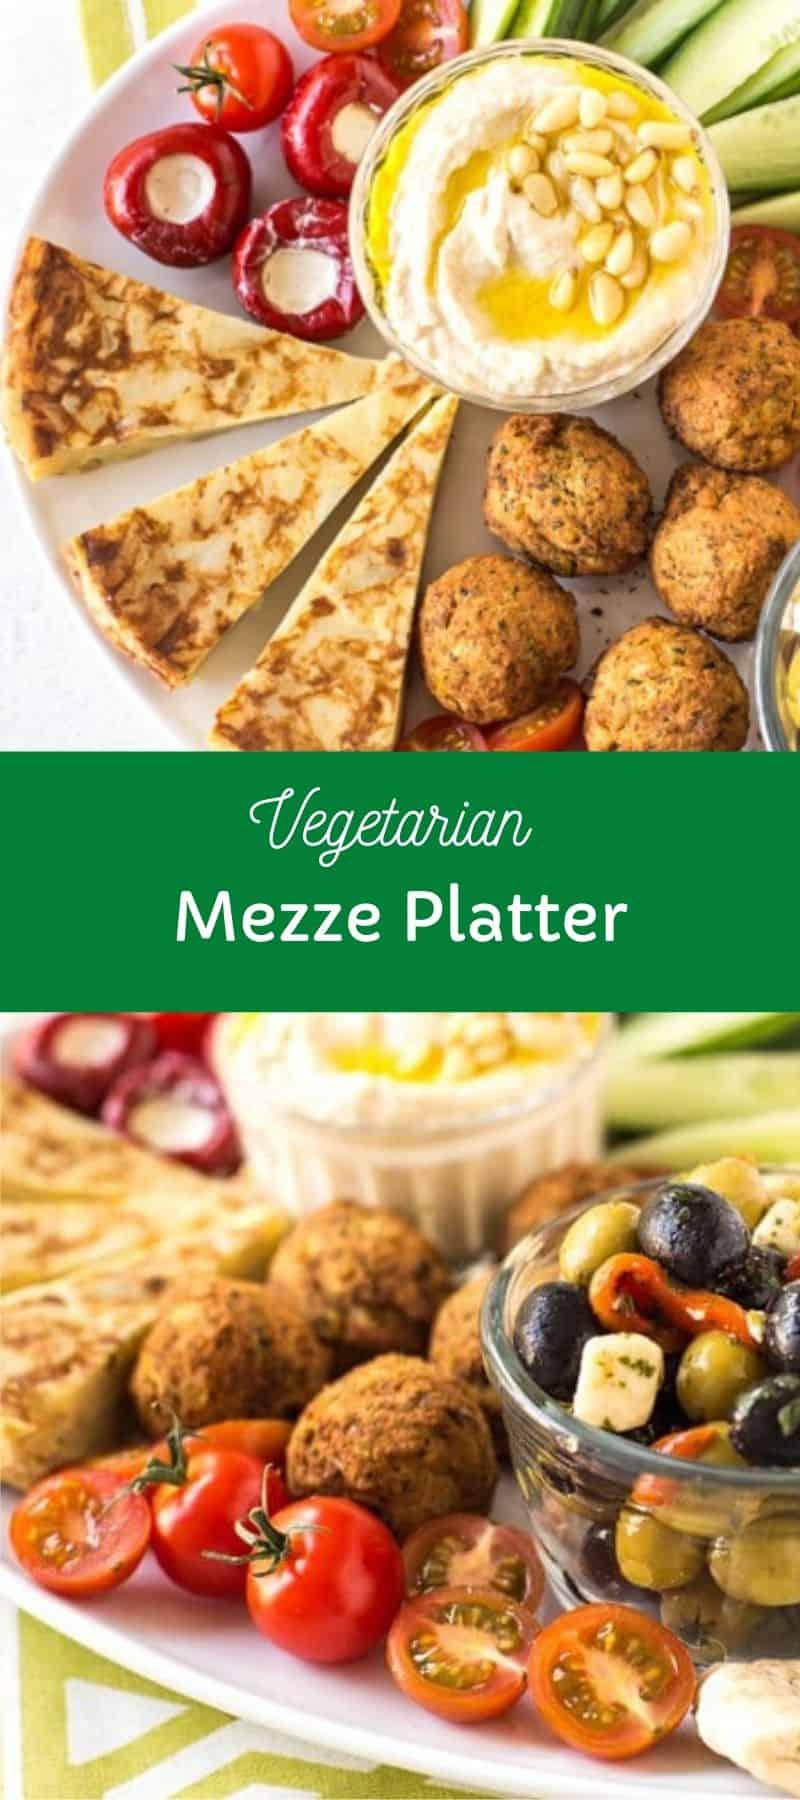 Vegetarian Mezze Platter 3